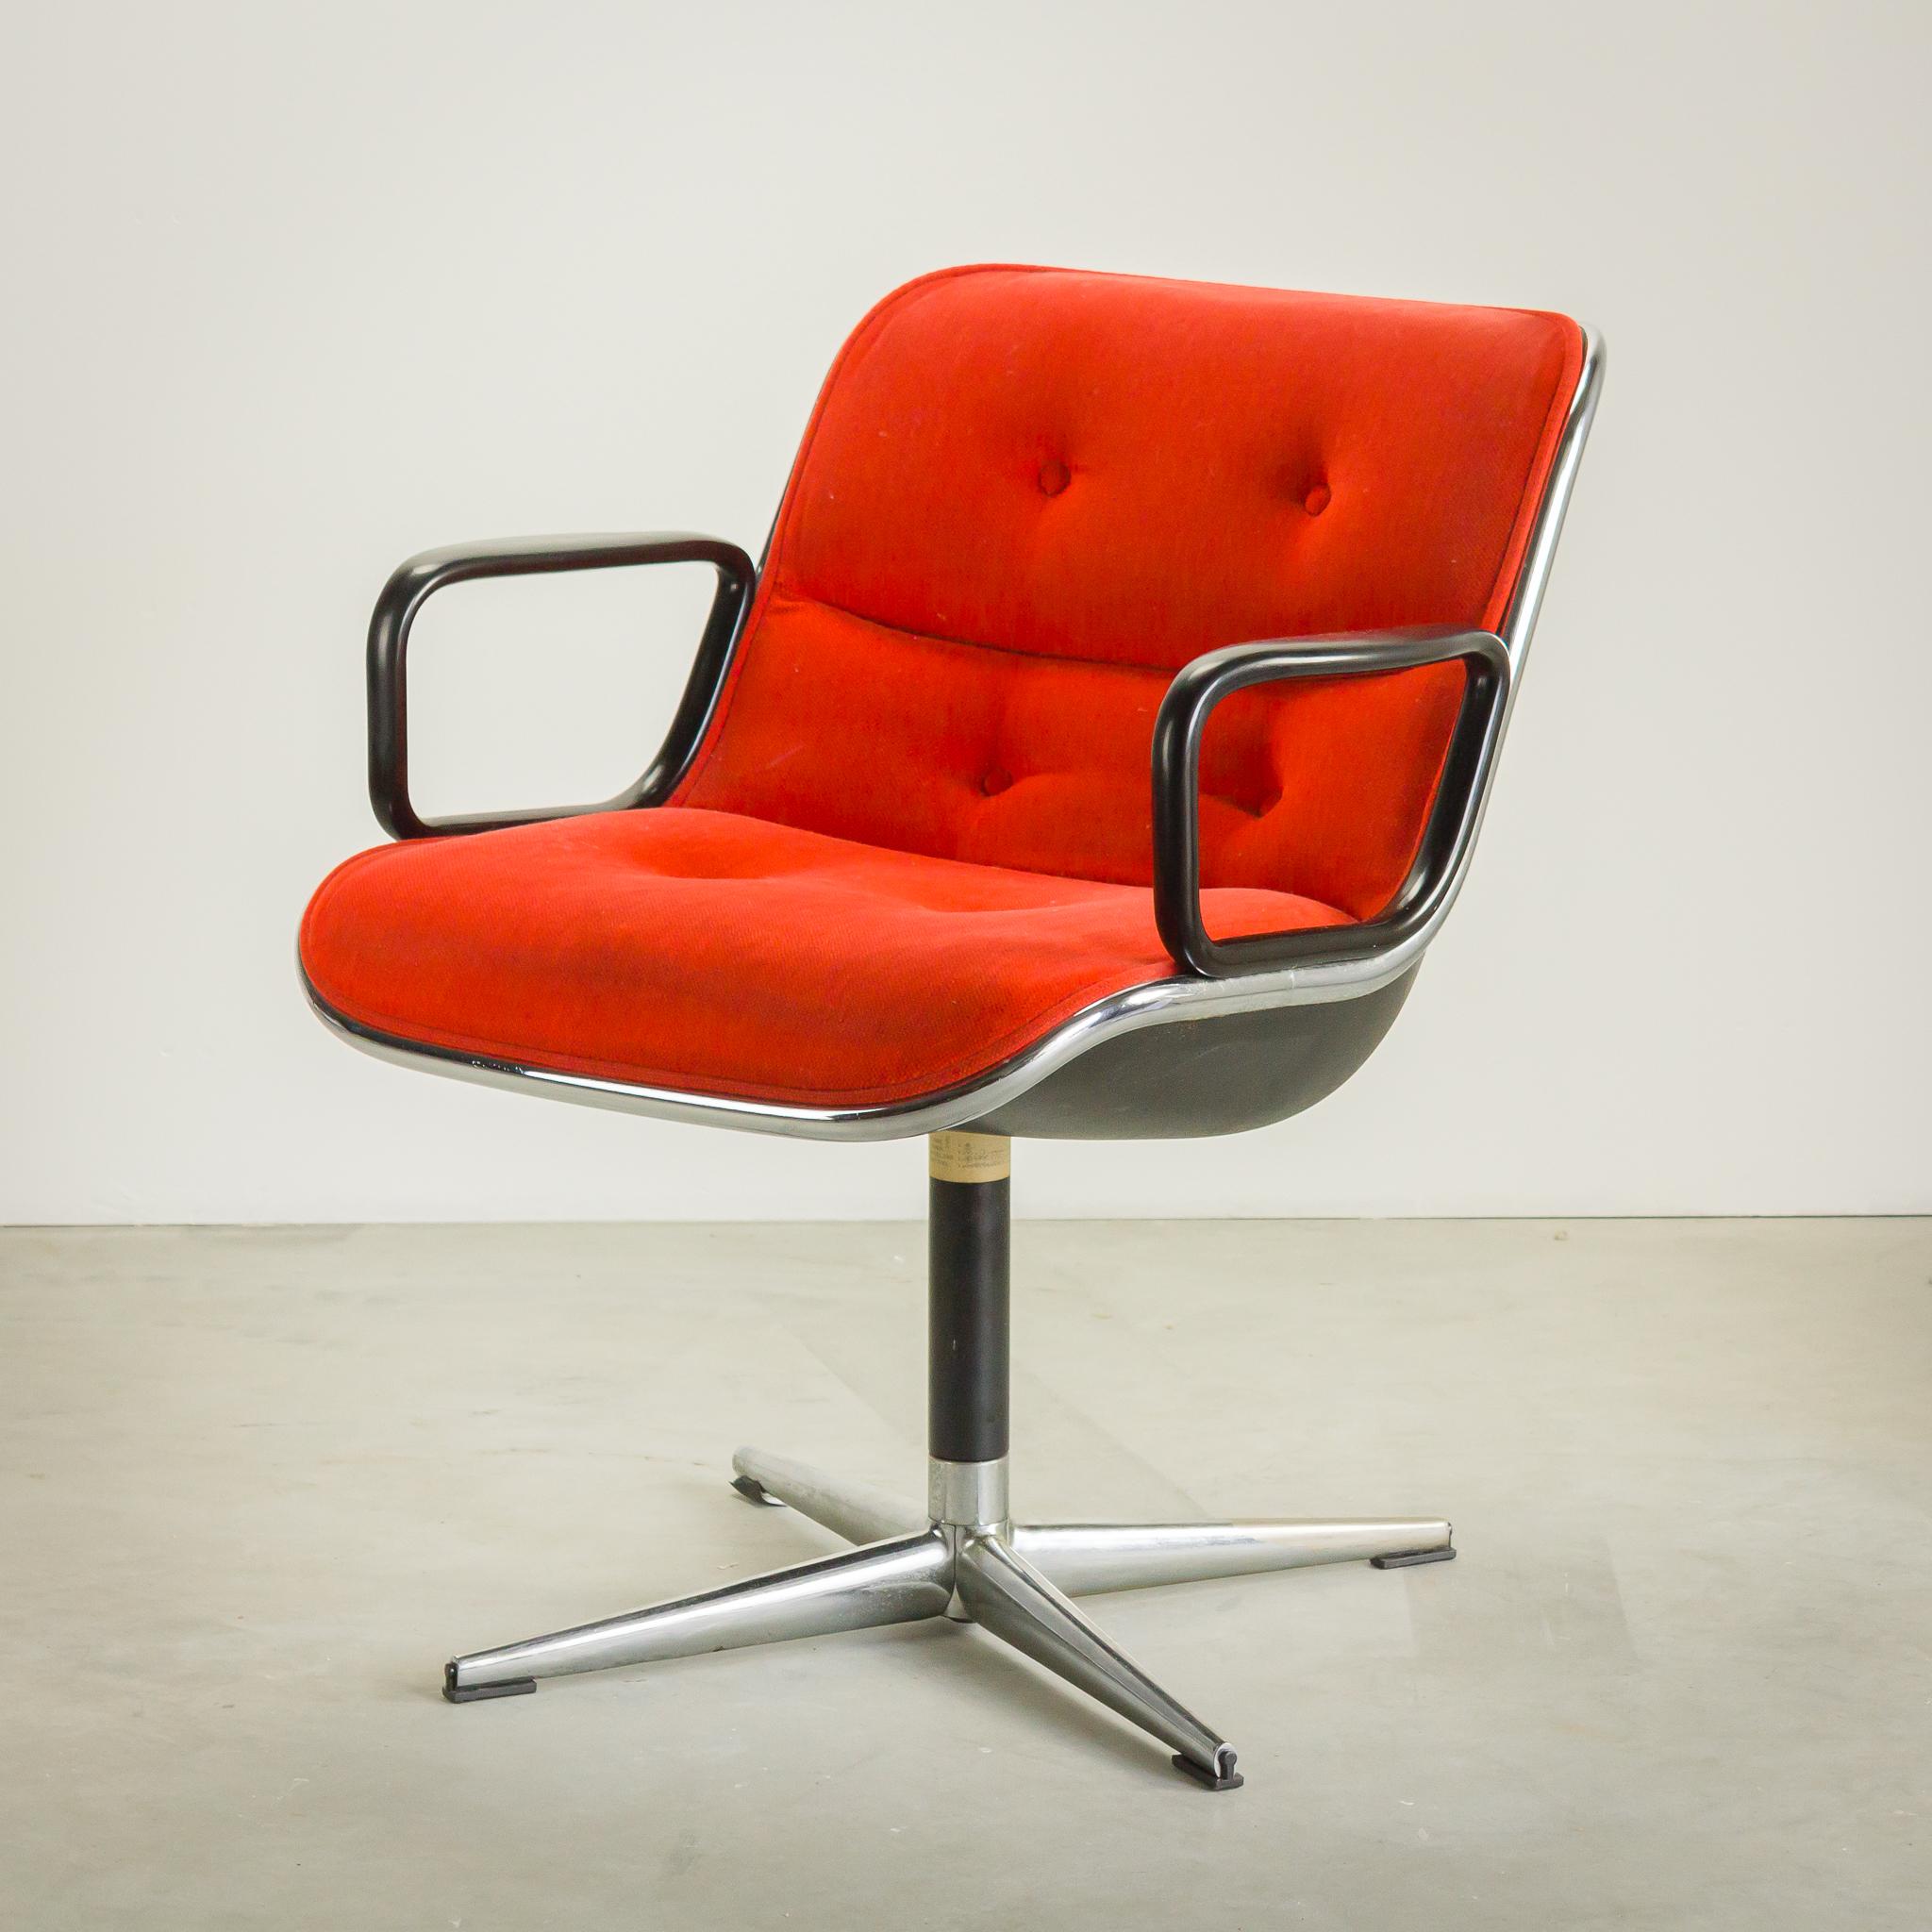 60 u2019s Knoll Executive bureaustoel by Charles Pollock   BarbMama